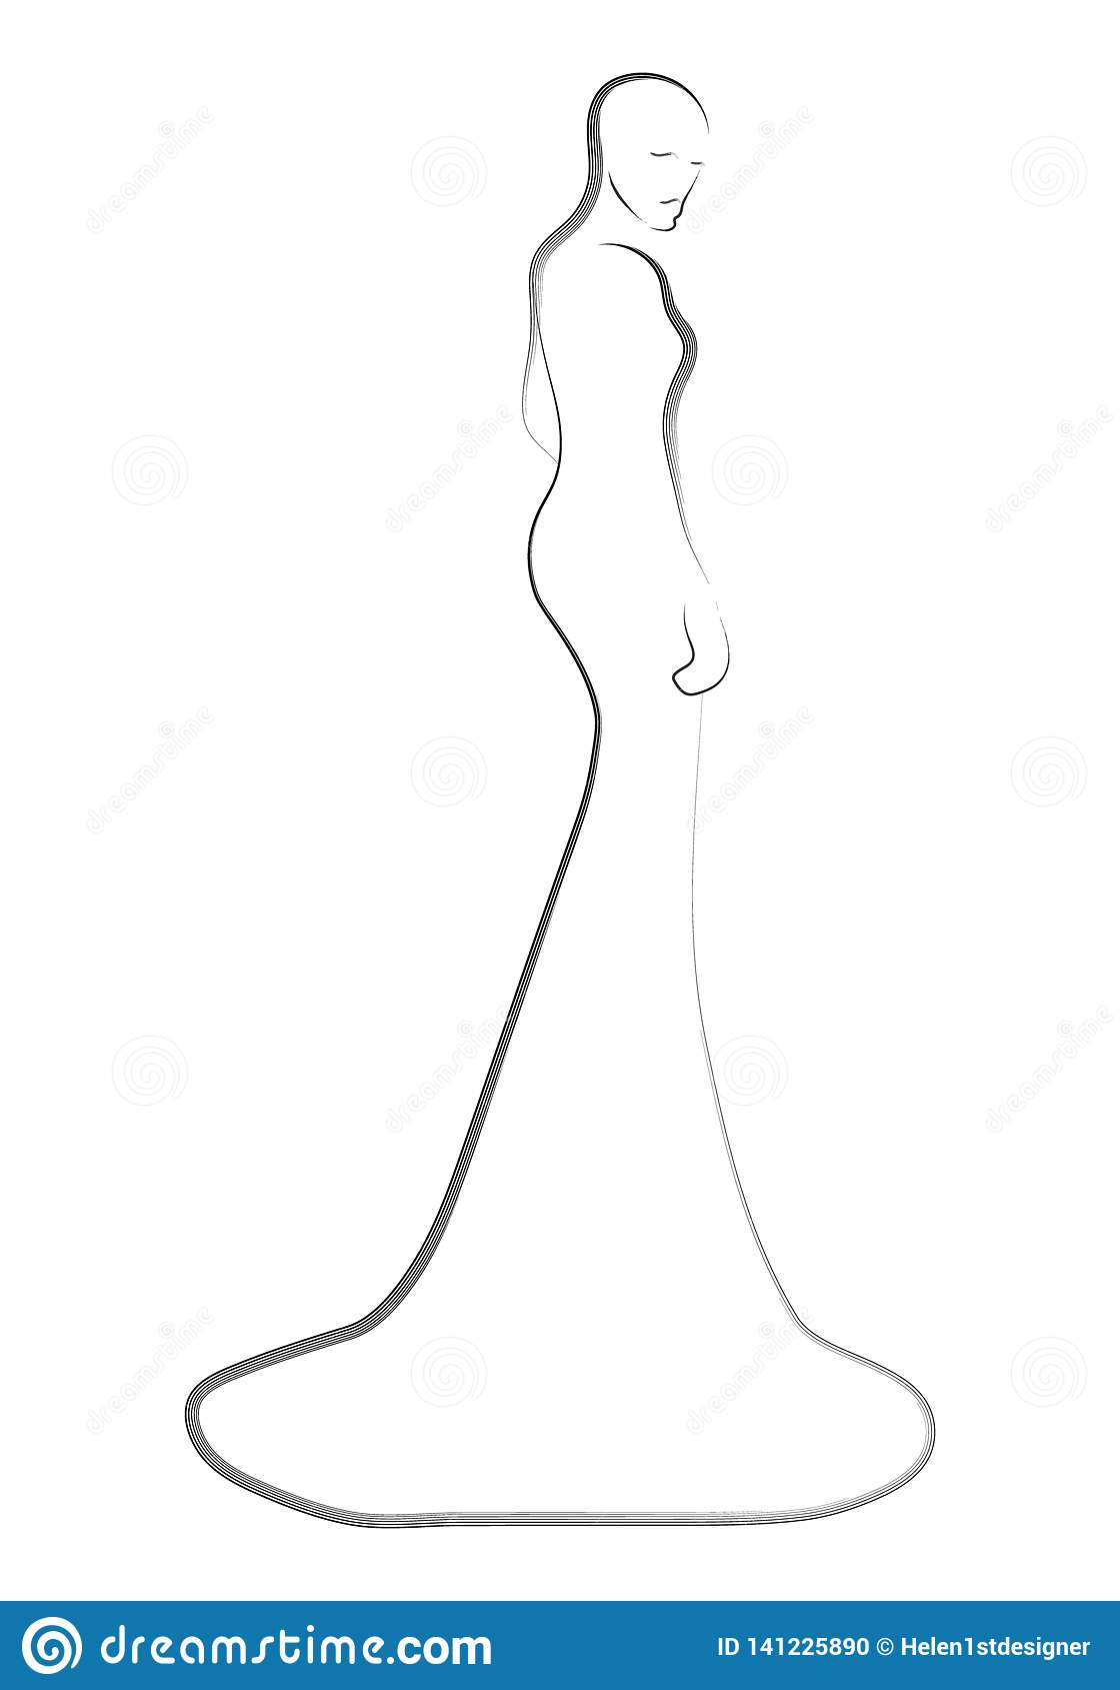 Fashion models in the dress sketch illustration